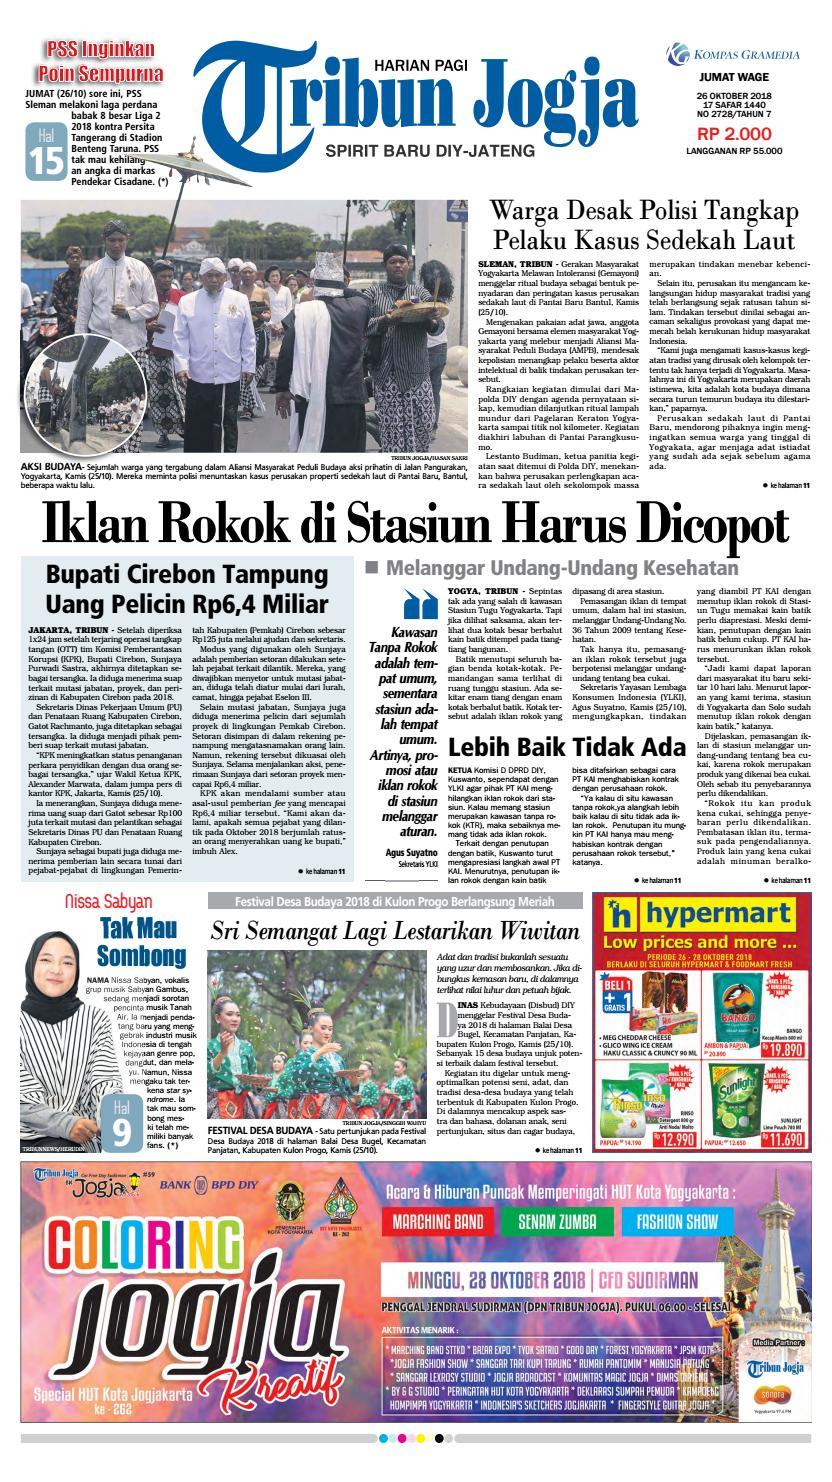 Tribun Jogja 26 10 2018 By Issuu Produk Ukm Bumn Batik Tulis Warna Alam Ra Ampamp